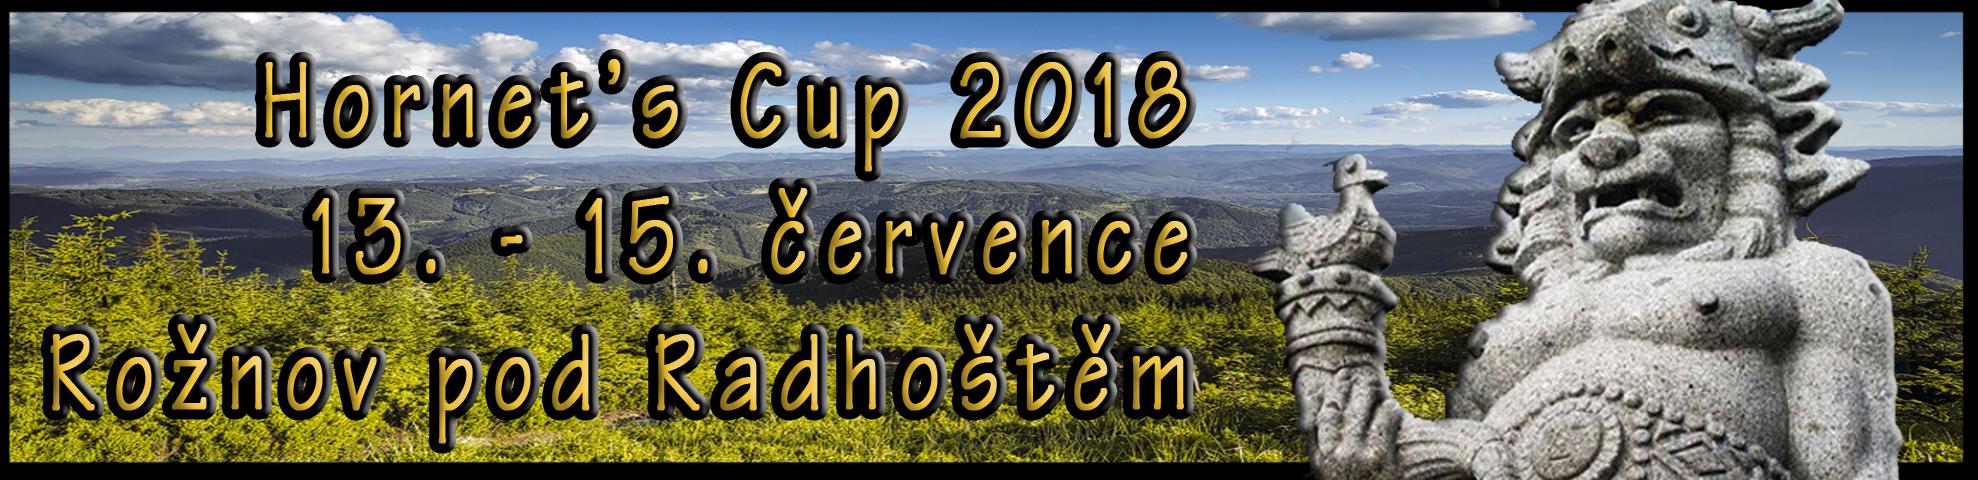 Hornet's Cup 2018